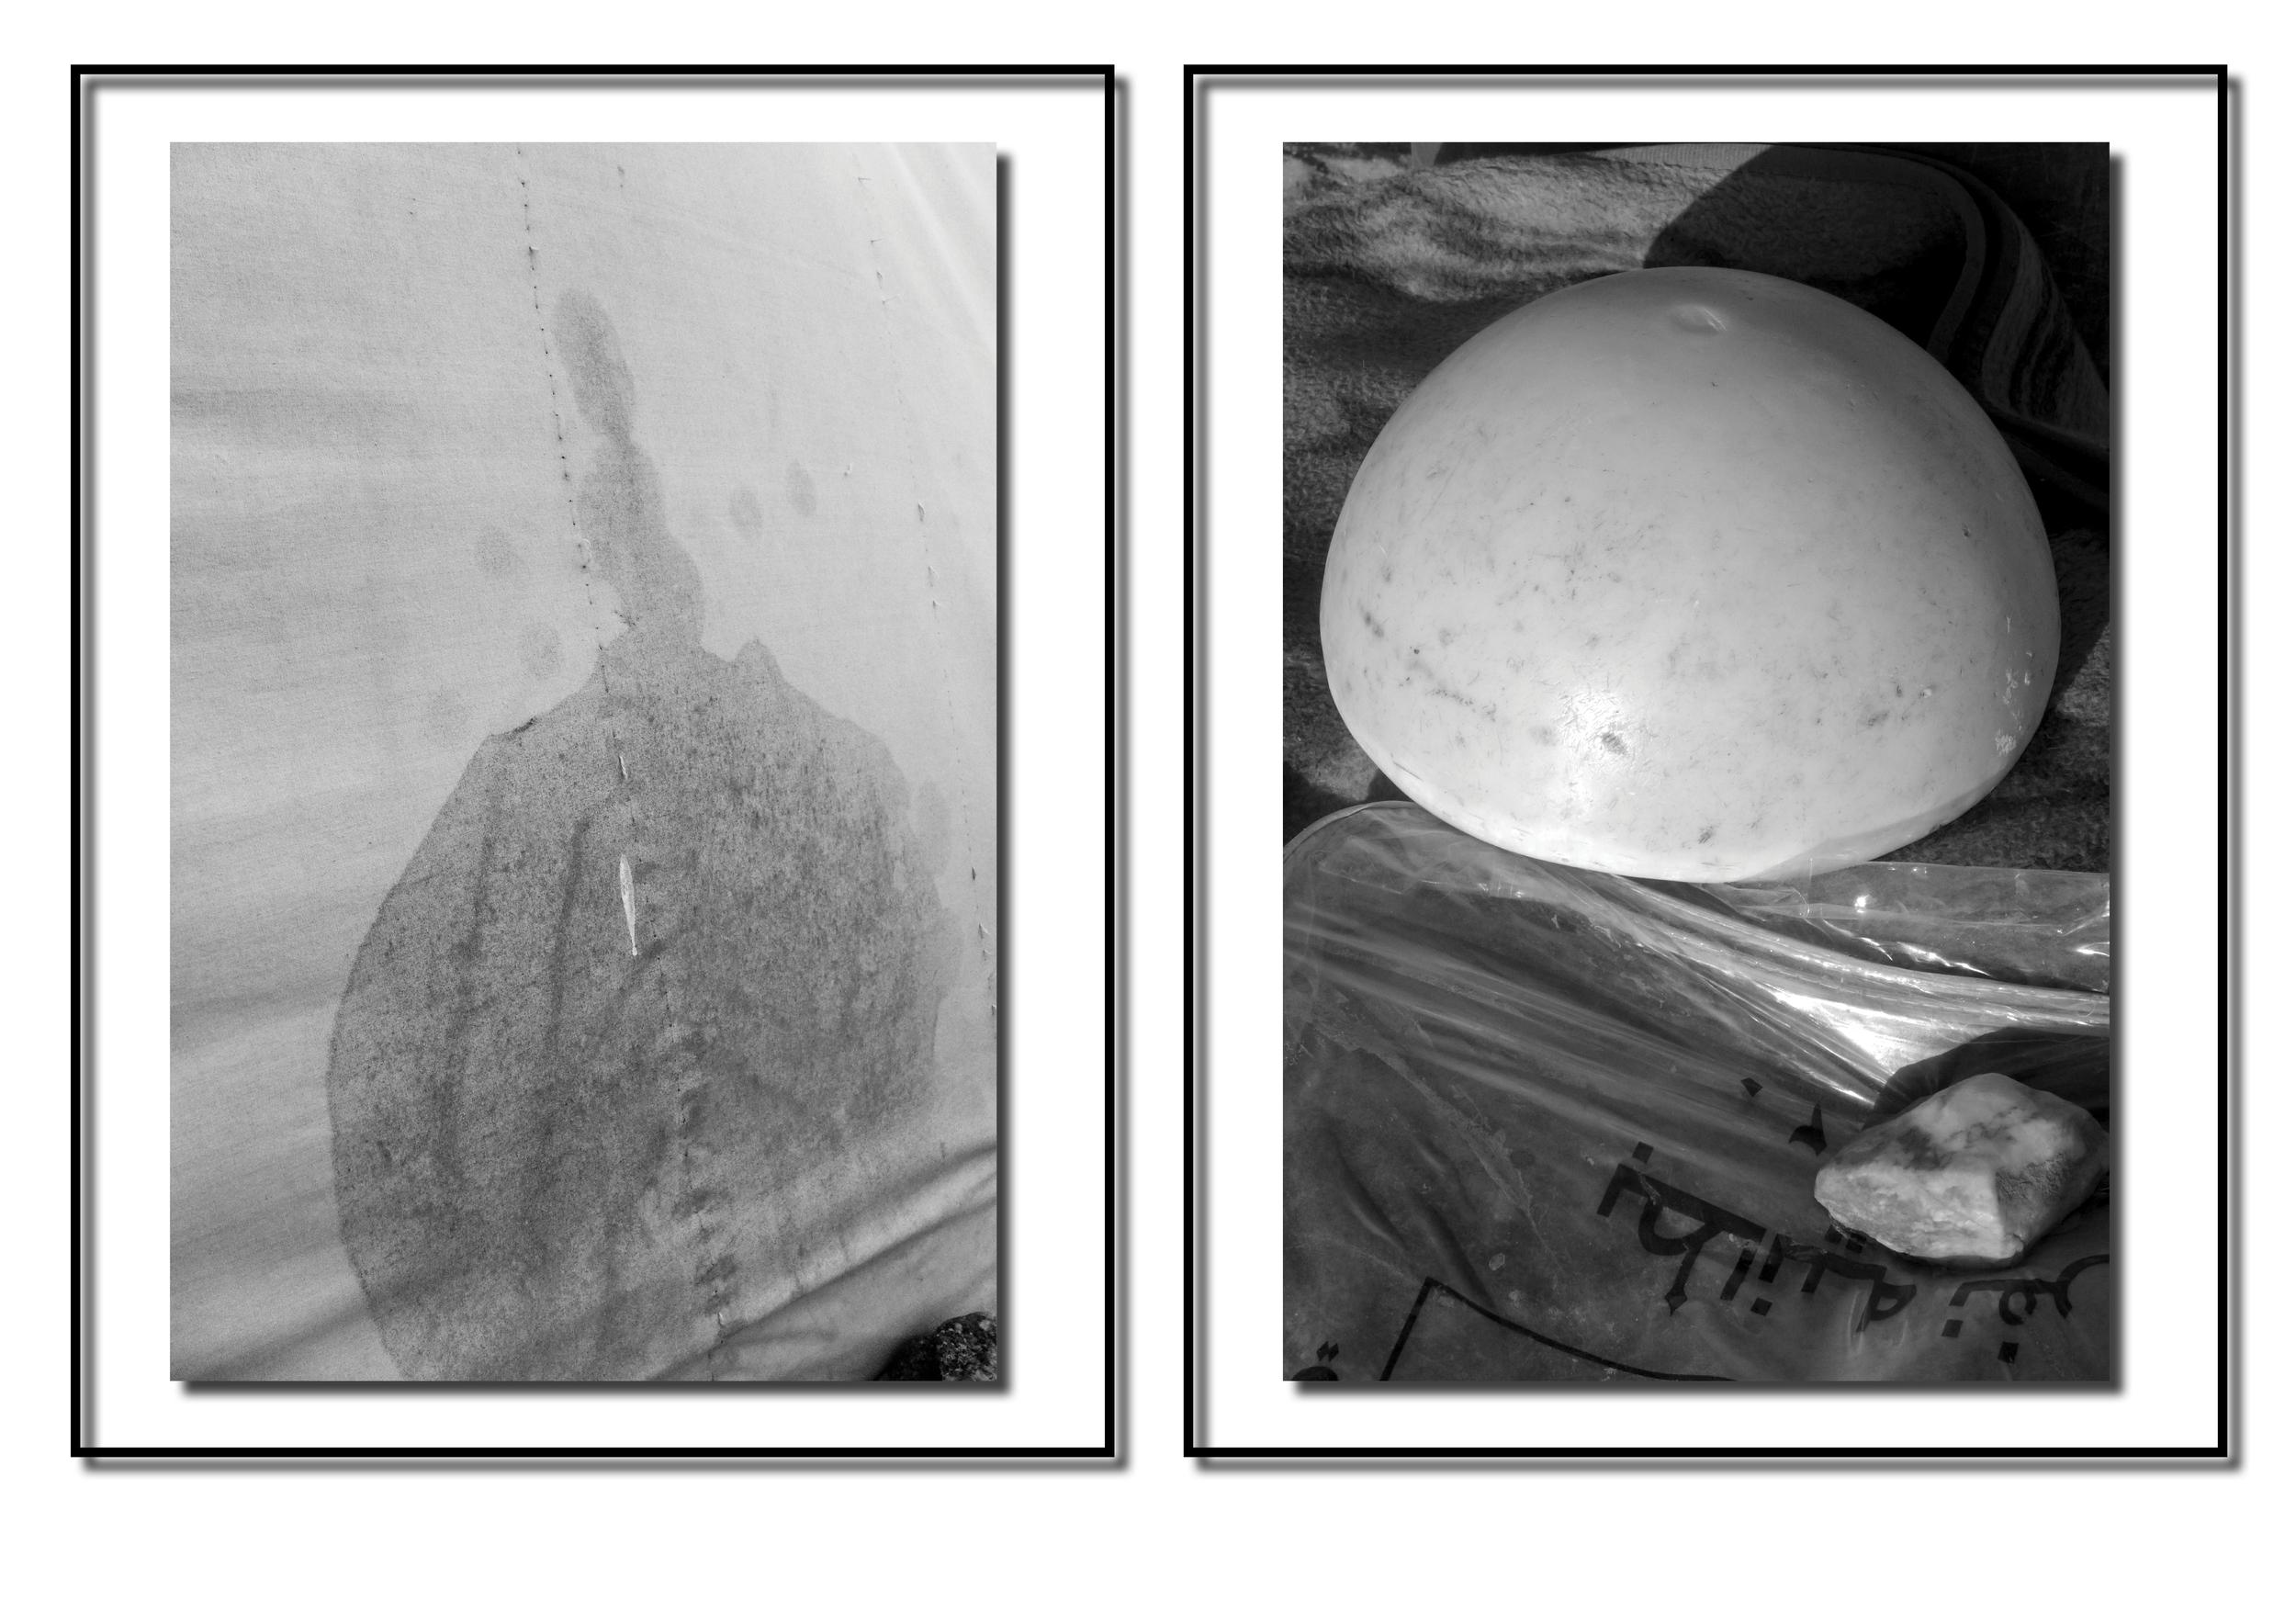 2Photographs.jpg